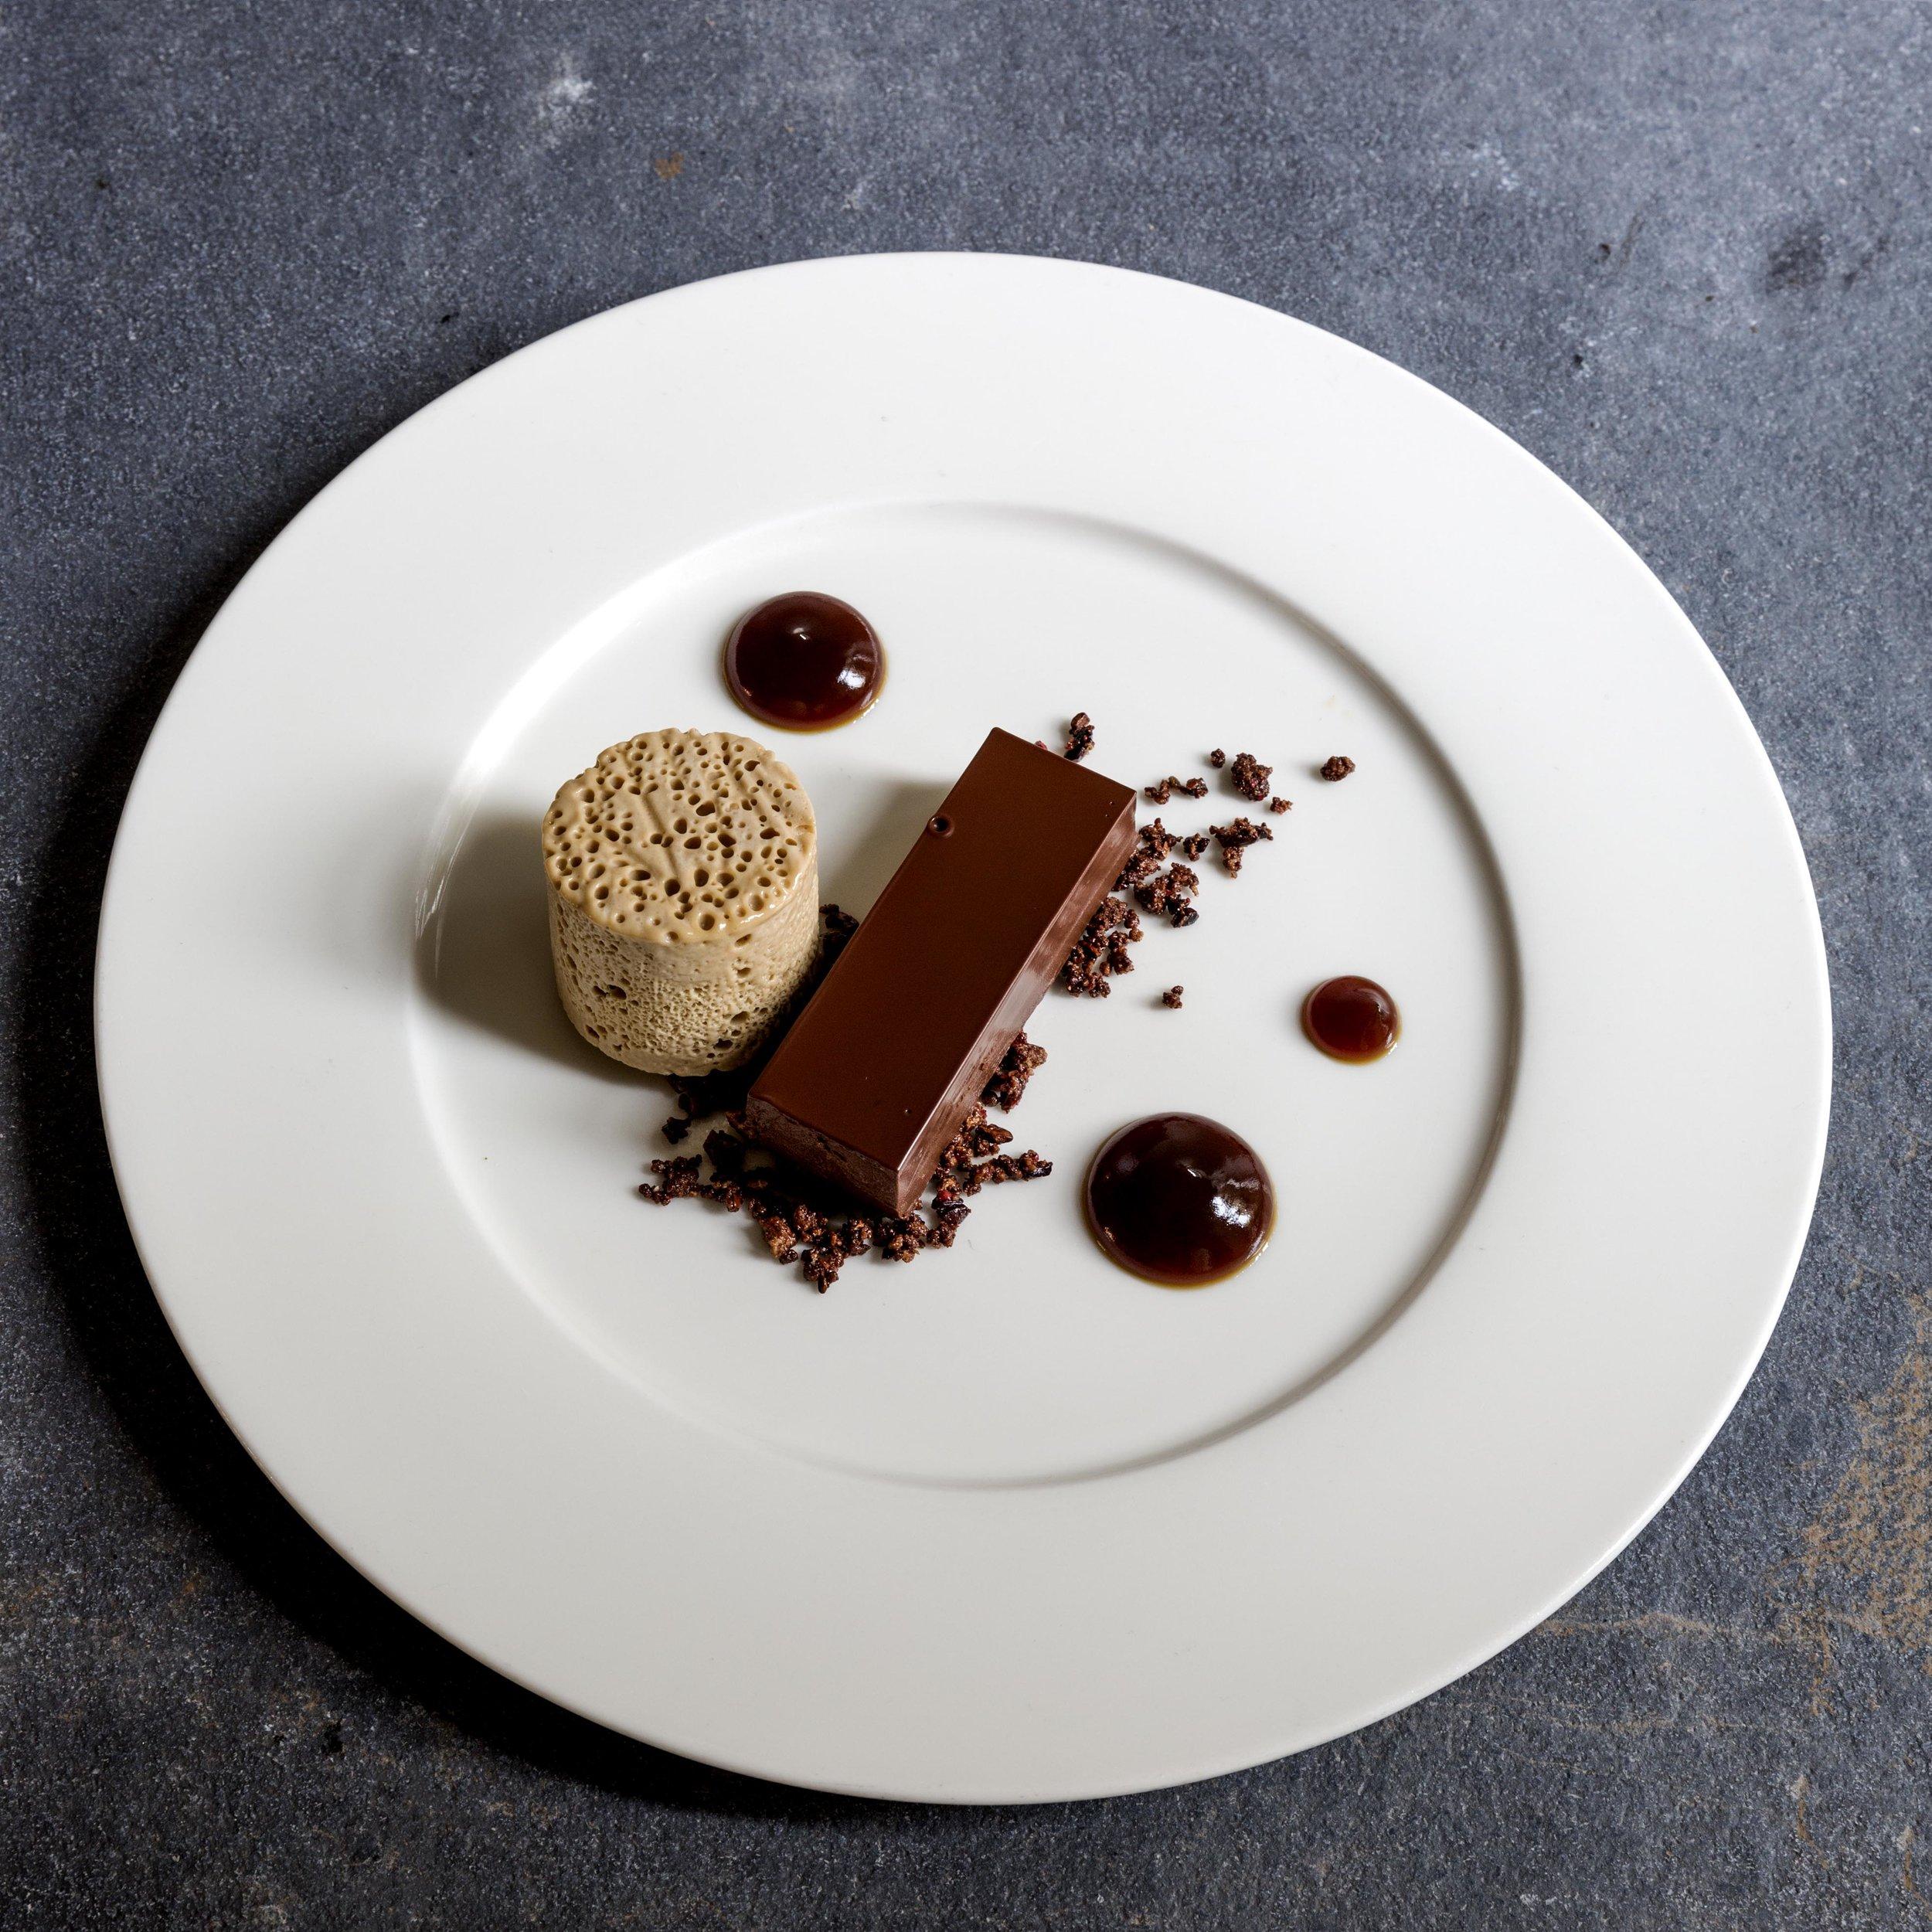 acorn restaurant bath vegetarian vegan plant based food british restaurants